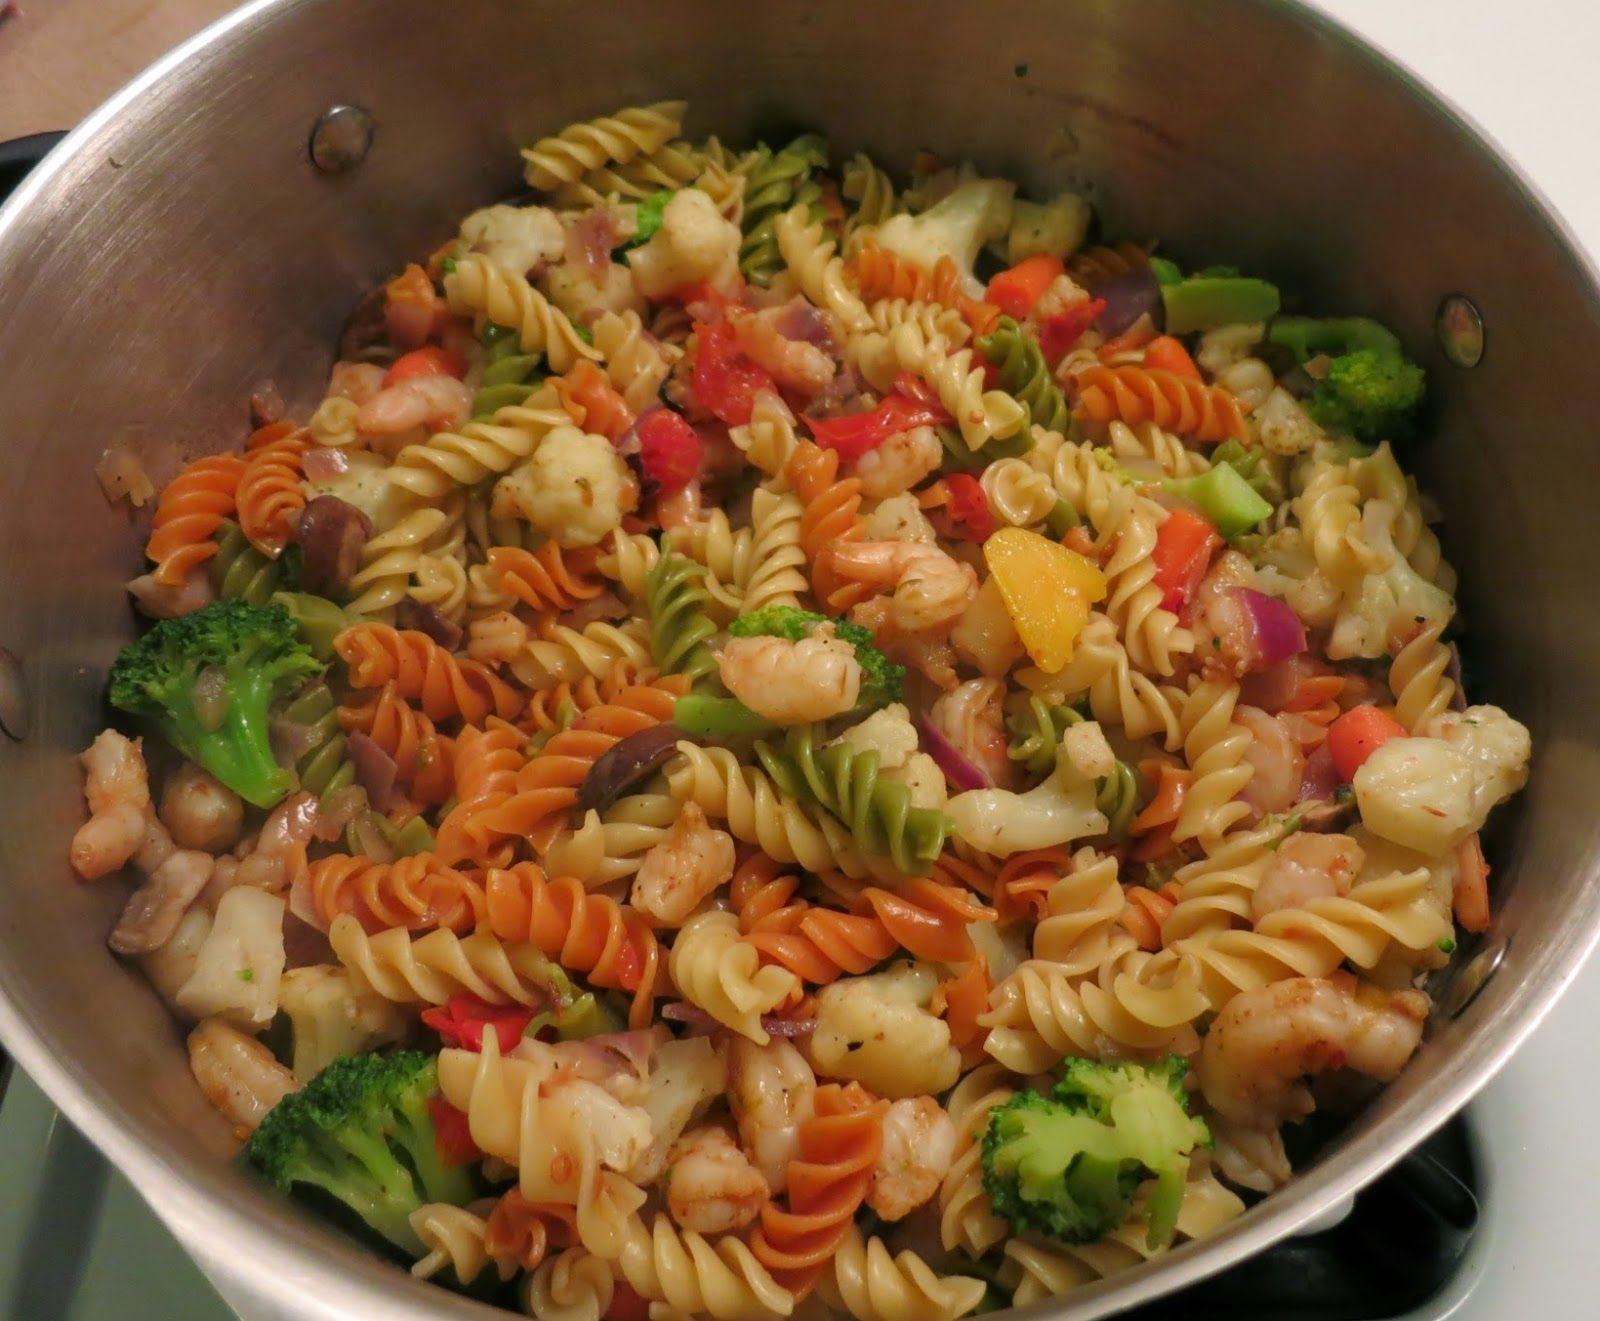 Foodhedonist's Jerk Shrimp Pasta #jerkshrimp Foodhedonist's Jerk Shrimp Pasta #jerkshrimp Foodhedonist's Jerk Shrimp Pasta #jerkshrimp Foodhedonist's Jerk Shrimp Pasta #jerkshrimp Foodhedonist's Jerk Shrimp Pasta #jerkshrimp Foodhedonist's Jerk Shrimp Pasta #jerkshrimp Foodhedonist's Jerk Shrimp Pasta #jerkshrimp Foodhedonist's Jerk Shrimp Pasta #jerkshrimp Foodhedonist's Jerk Shrimp Pasta #jerkshrimp Foodhedonist's Jerk Shrimp Pasta #jerkshrimp Foodhedonist's Jerk Shrimp P #jerkshrimp